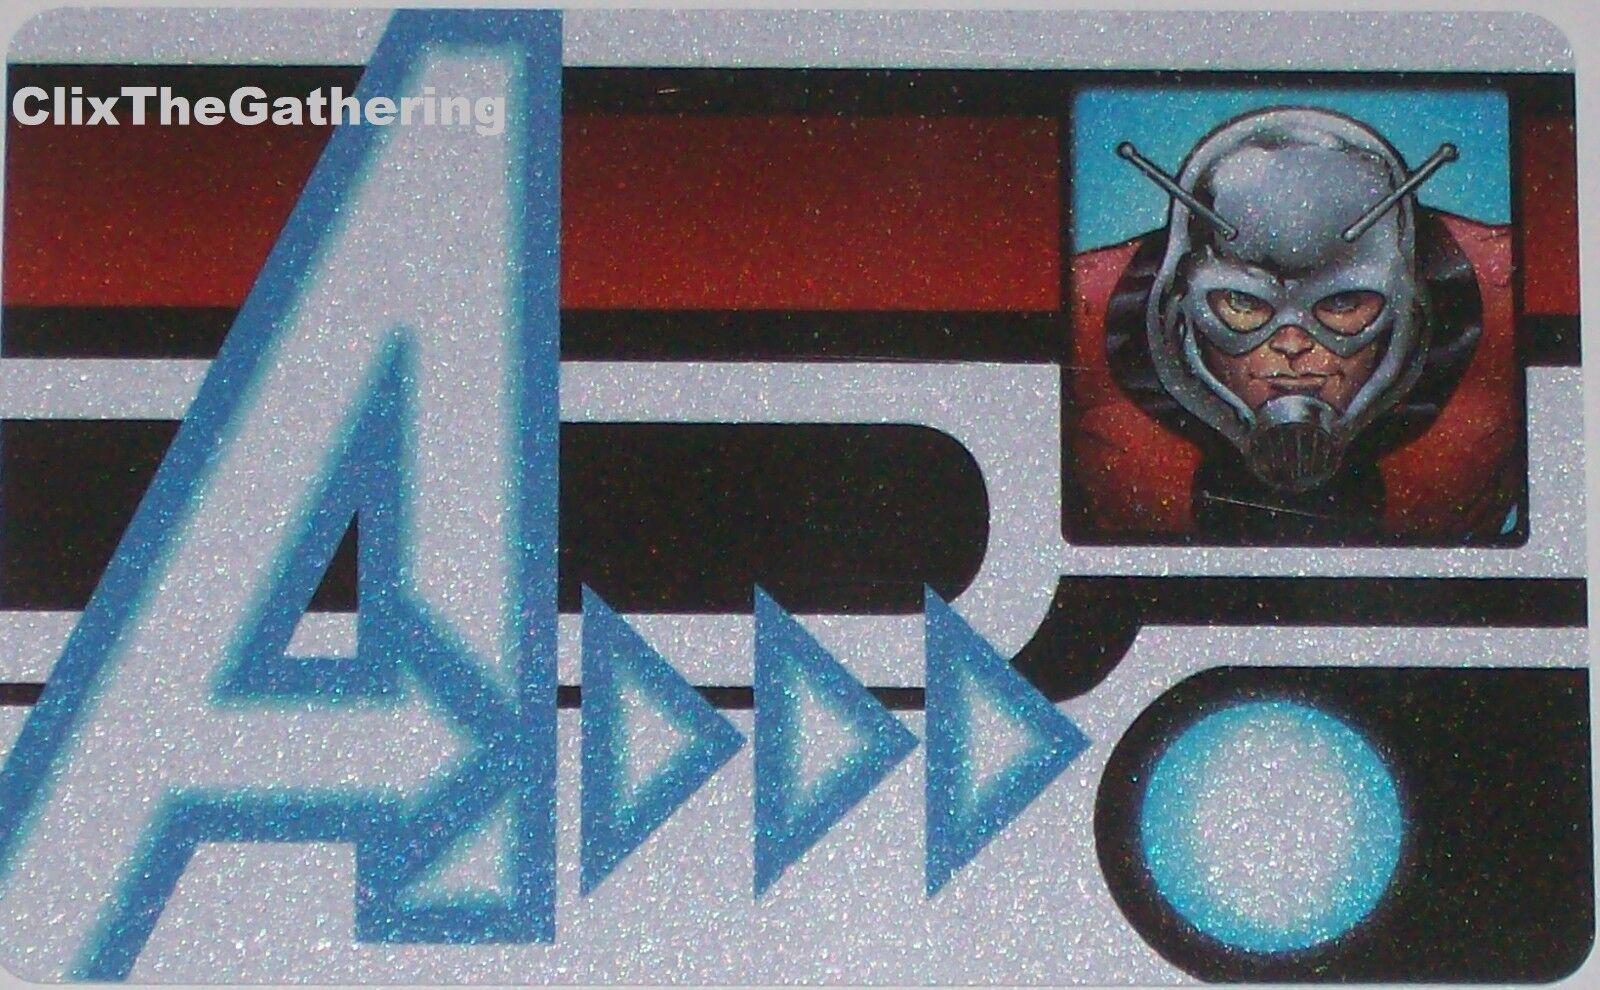 MVID-001 ANT-MAN(SCOTT LANG) ID CARD Promotional Exclusive Marvel Heroclix